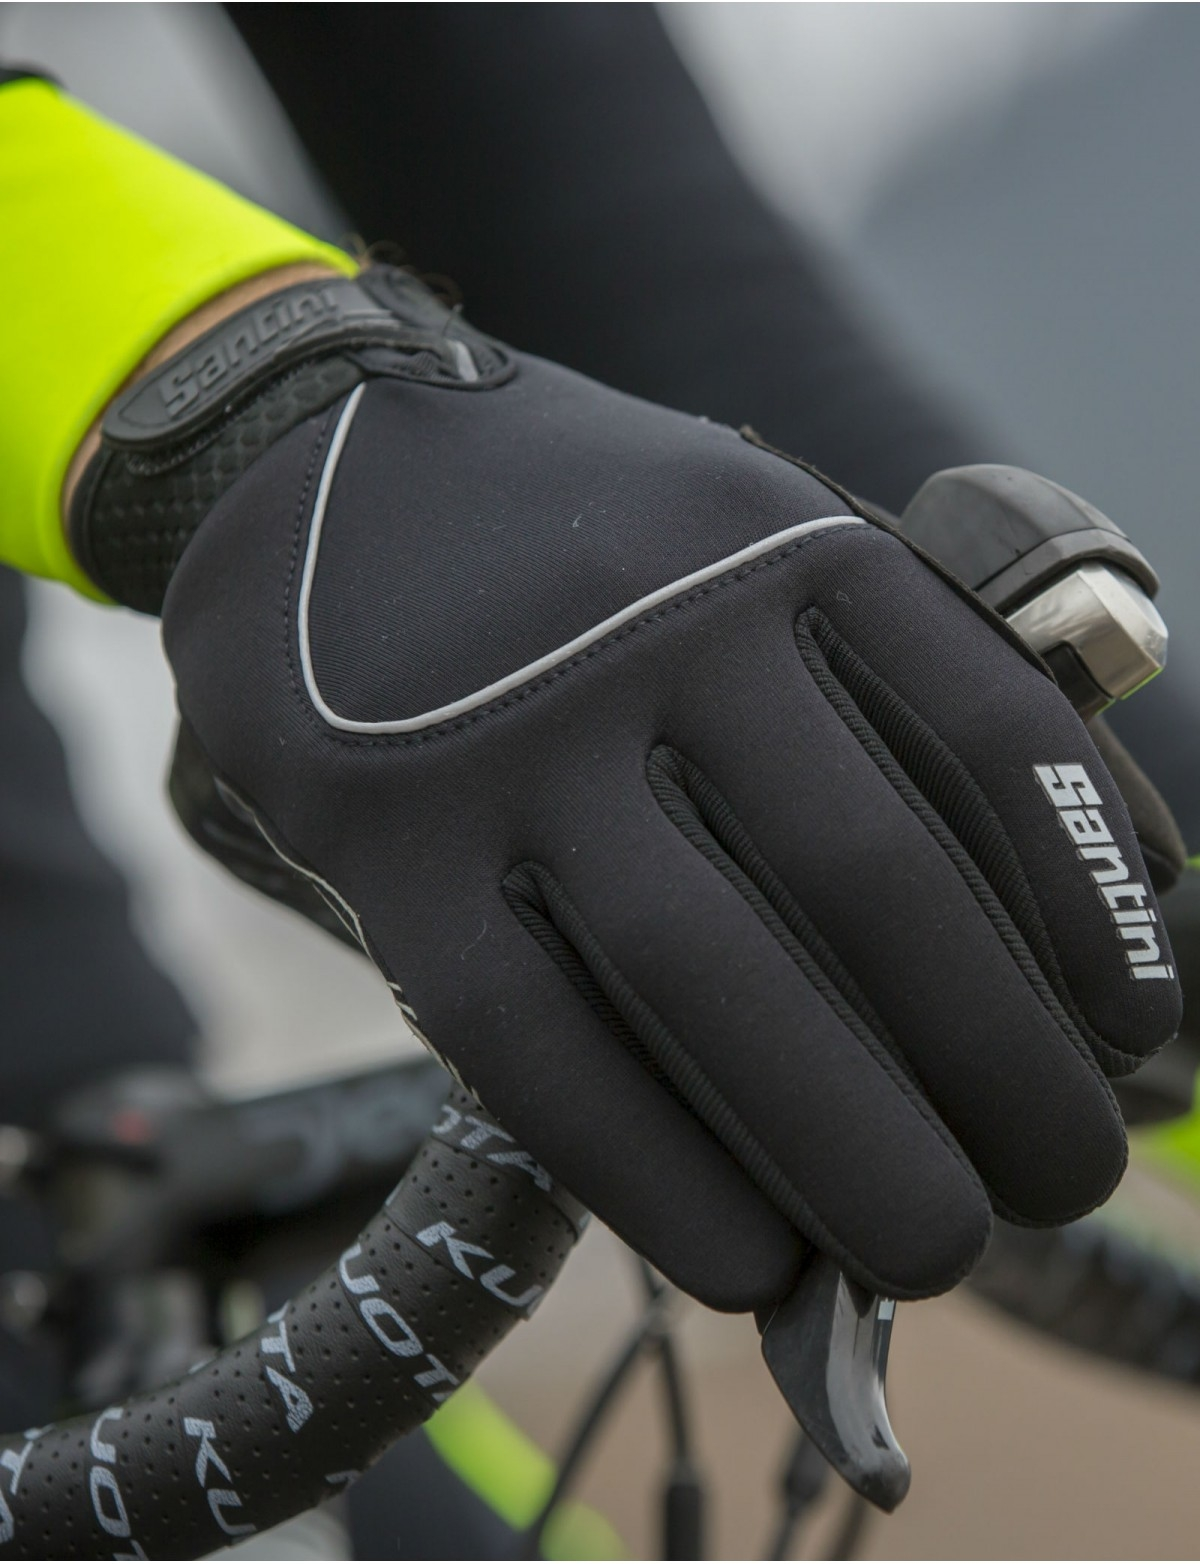 Santini Studio Win χειμερινά γάντια - Δαλαβίκας bikes 8d5c3e1ef88